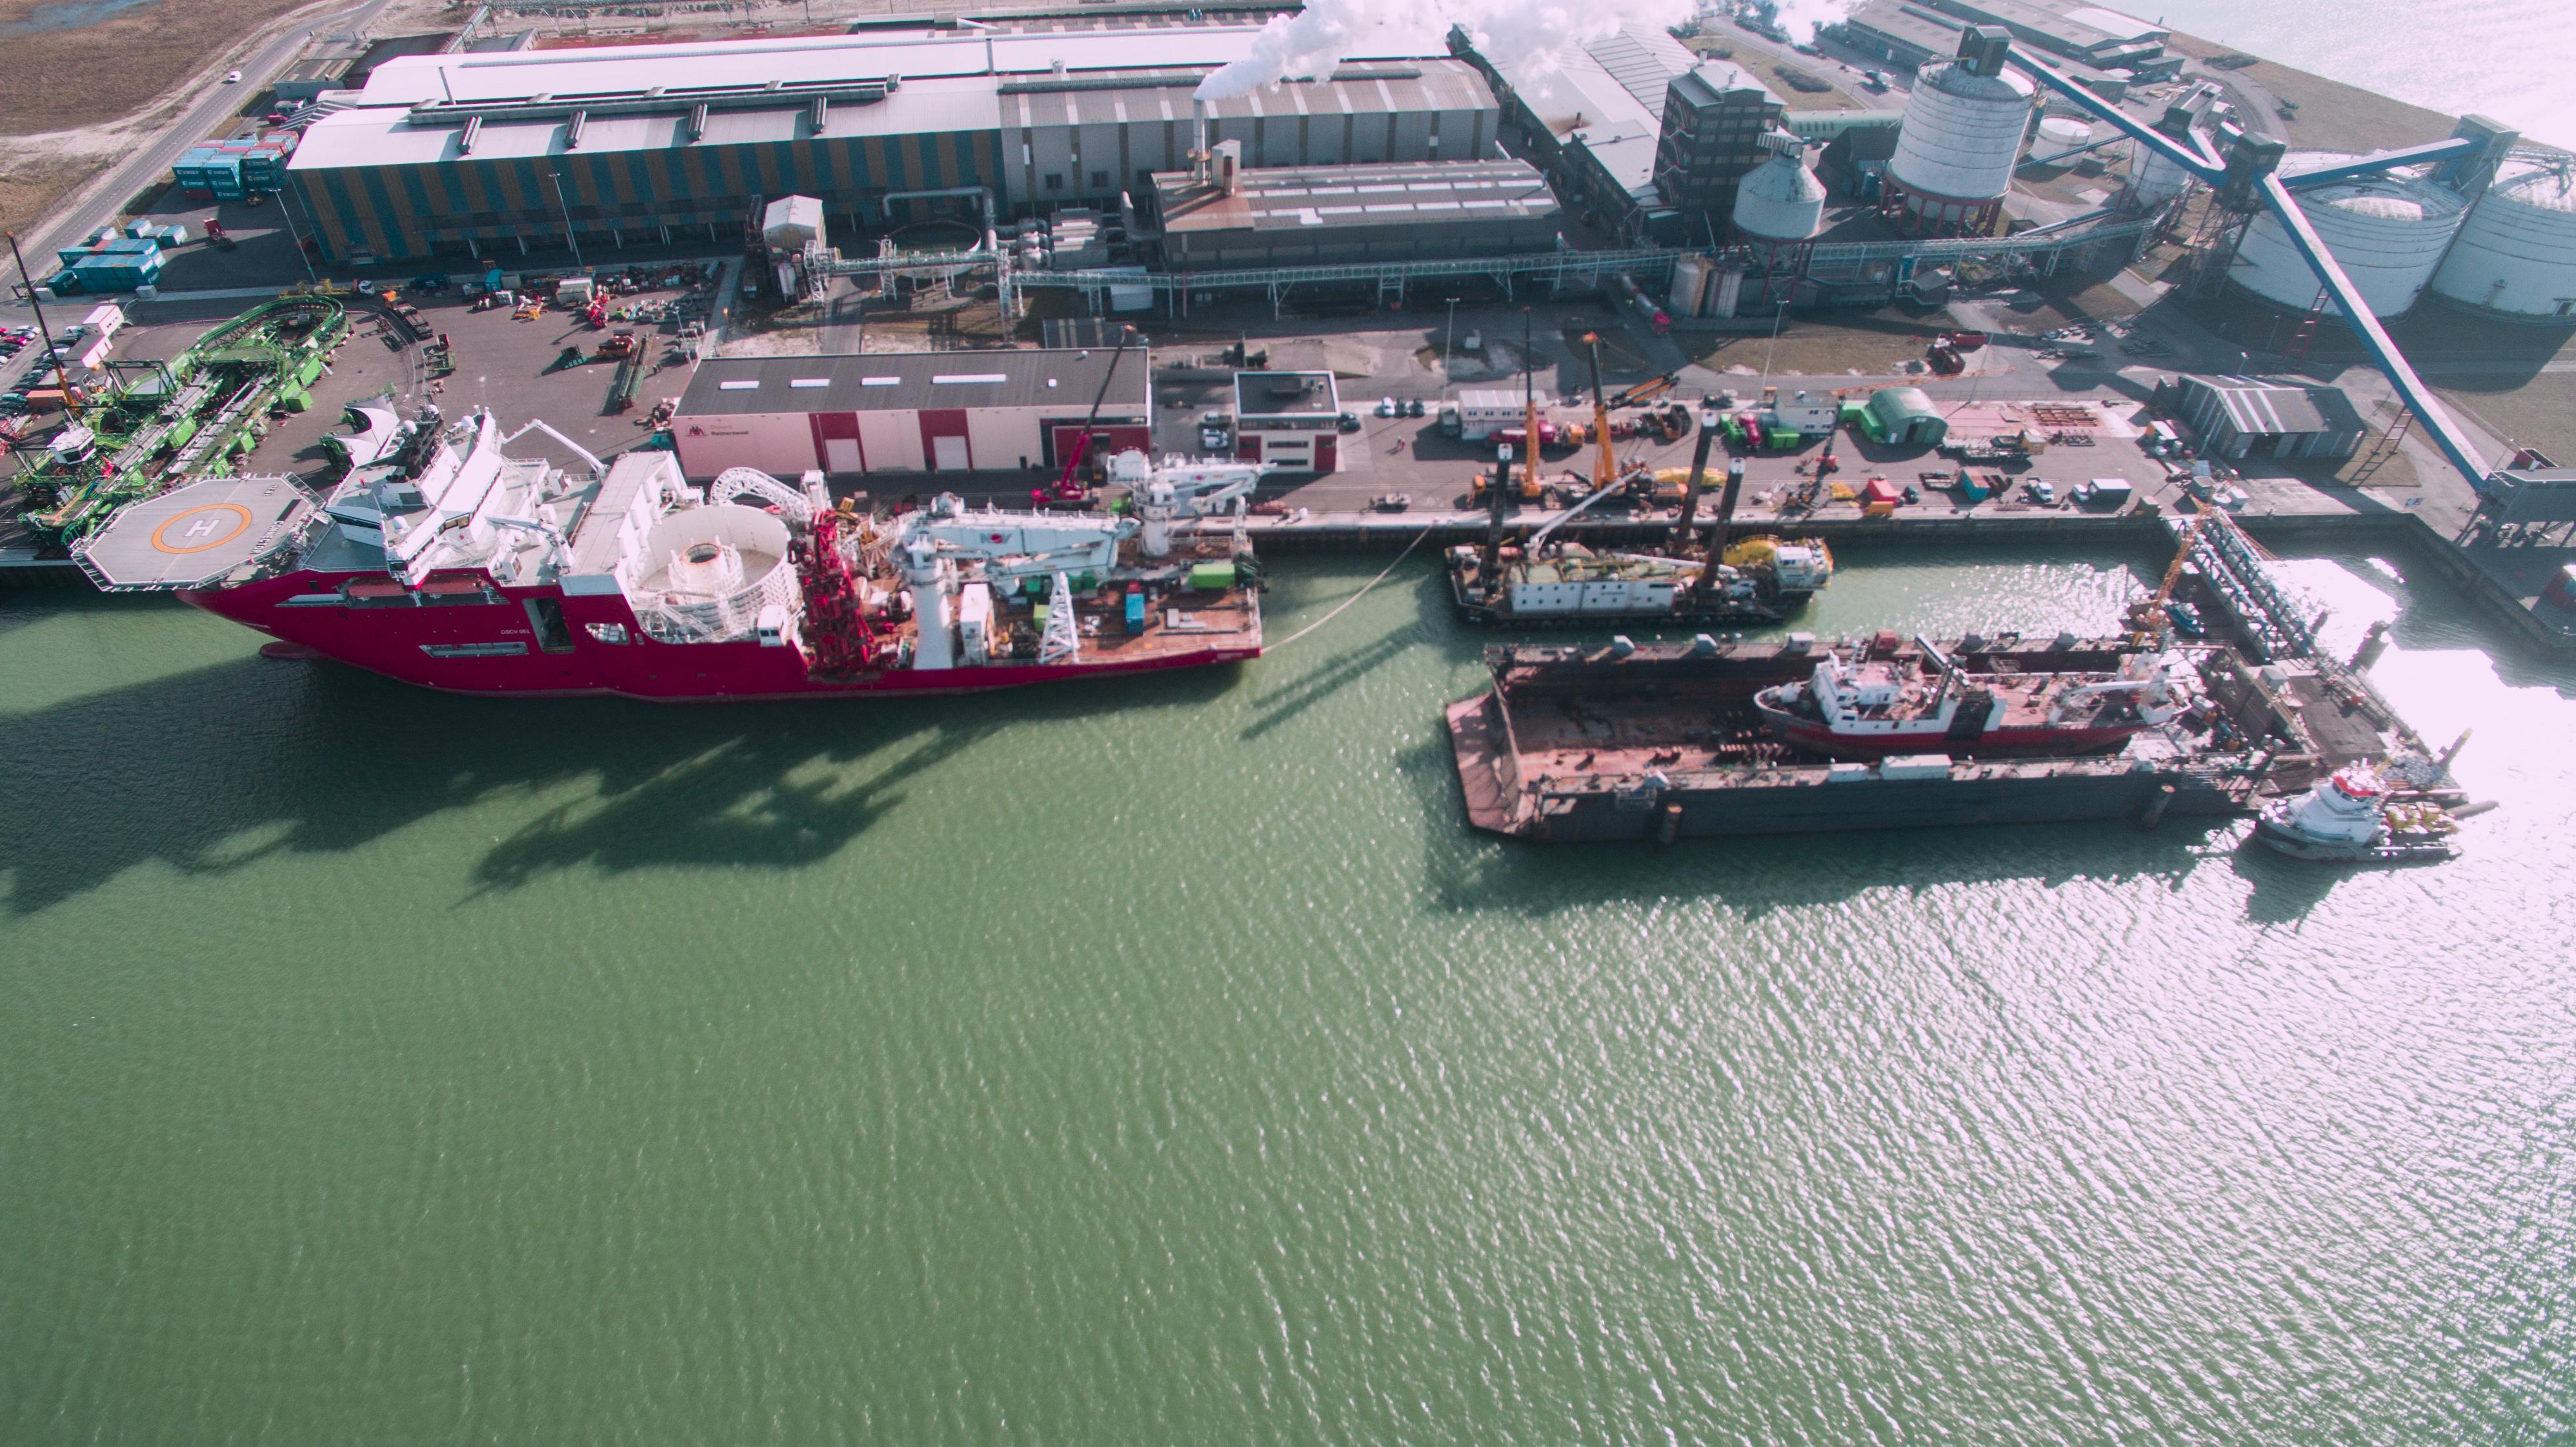 SHIPYARD REIMERSWAAL